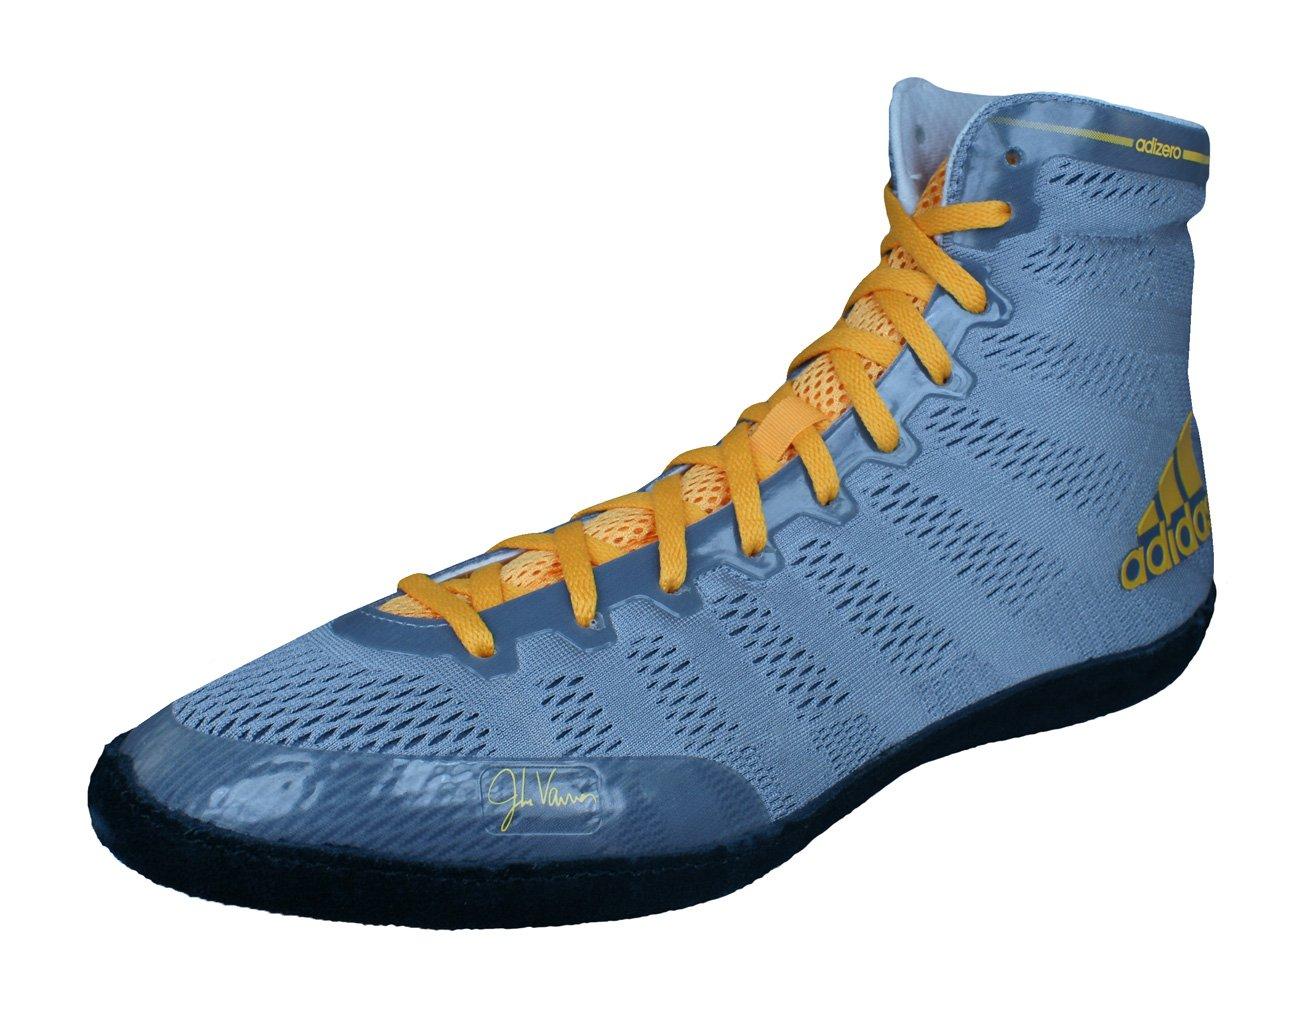 adidas Adizero Wrestling XIV Mens Wrestling Shoes/Sneakers-Grey-13.5 by adidas